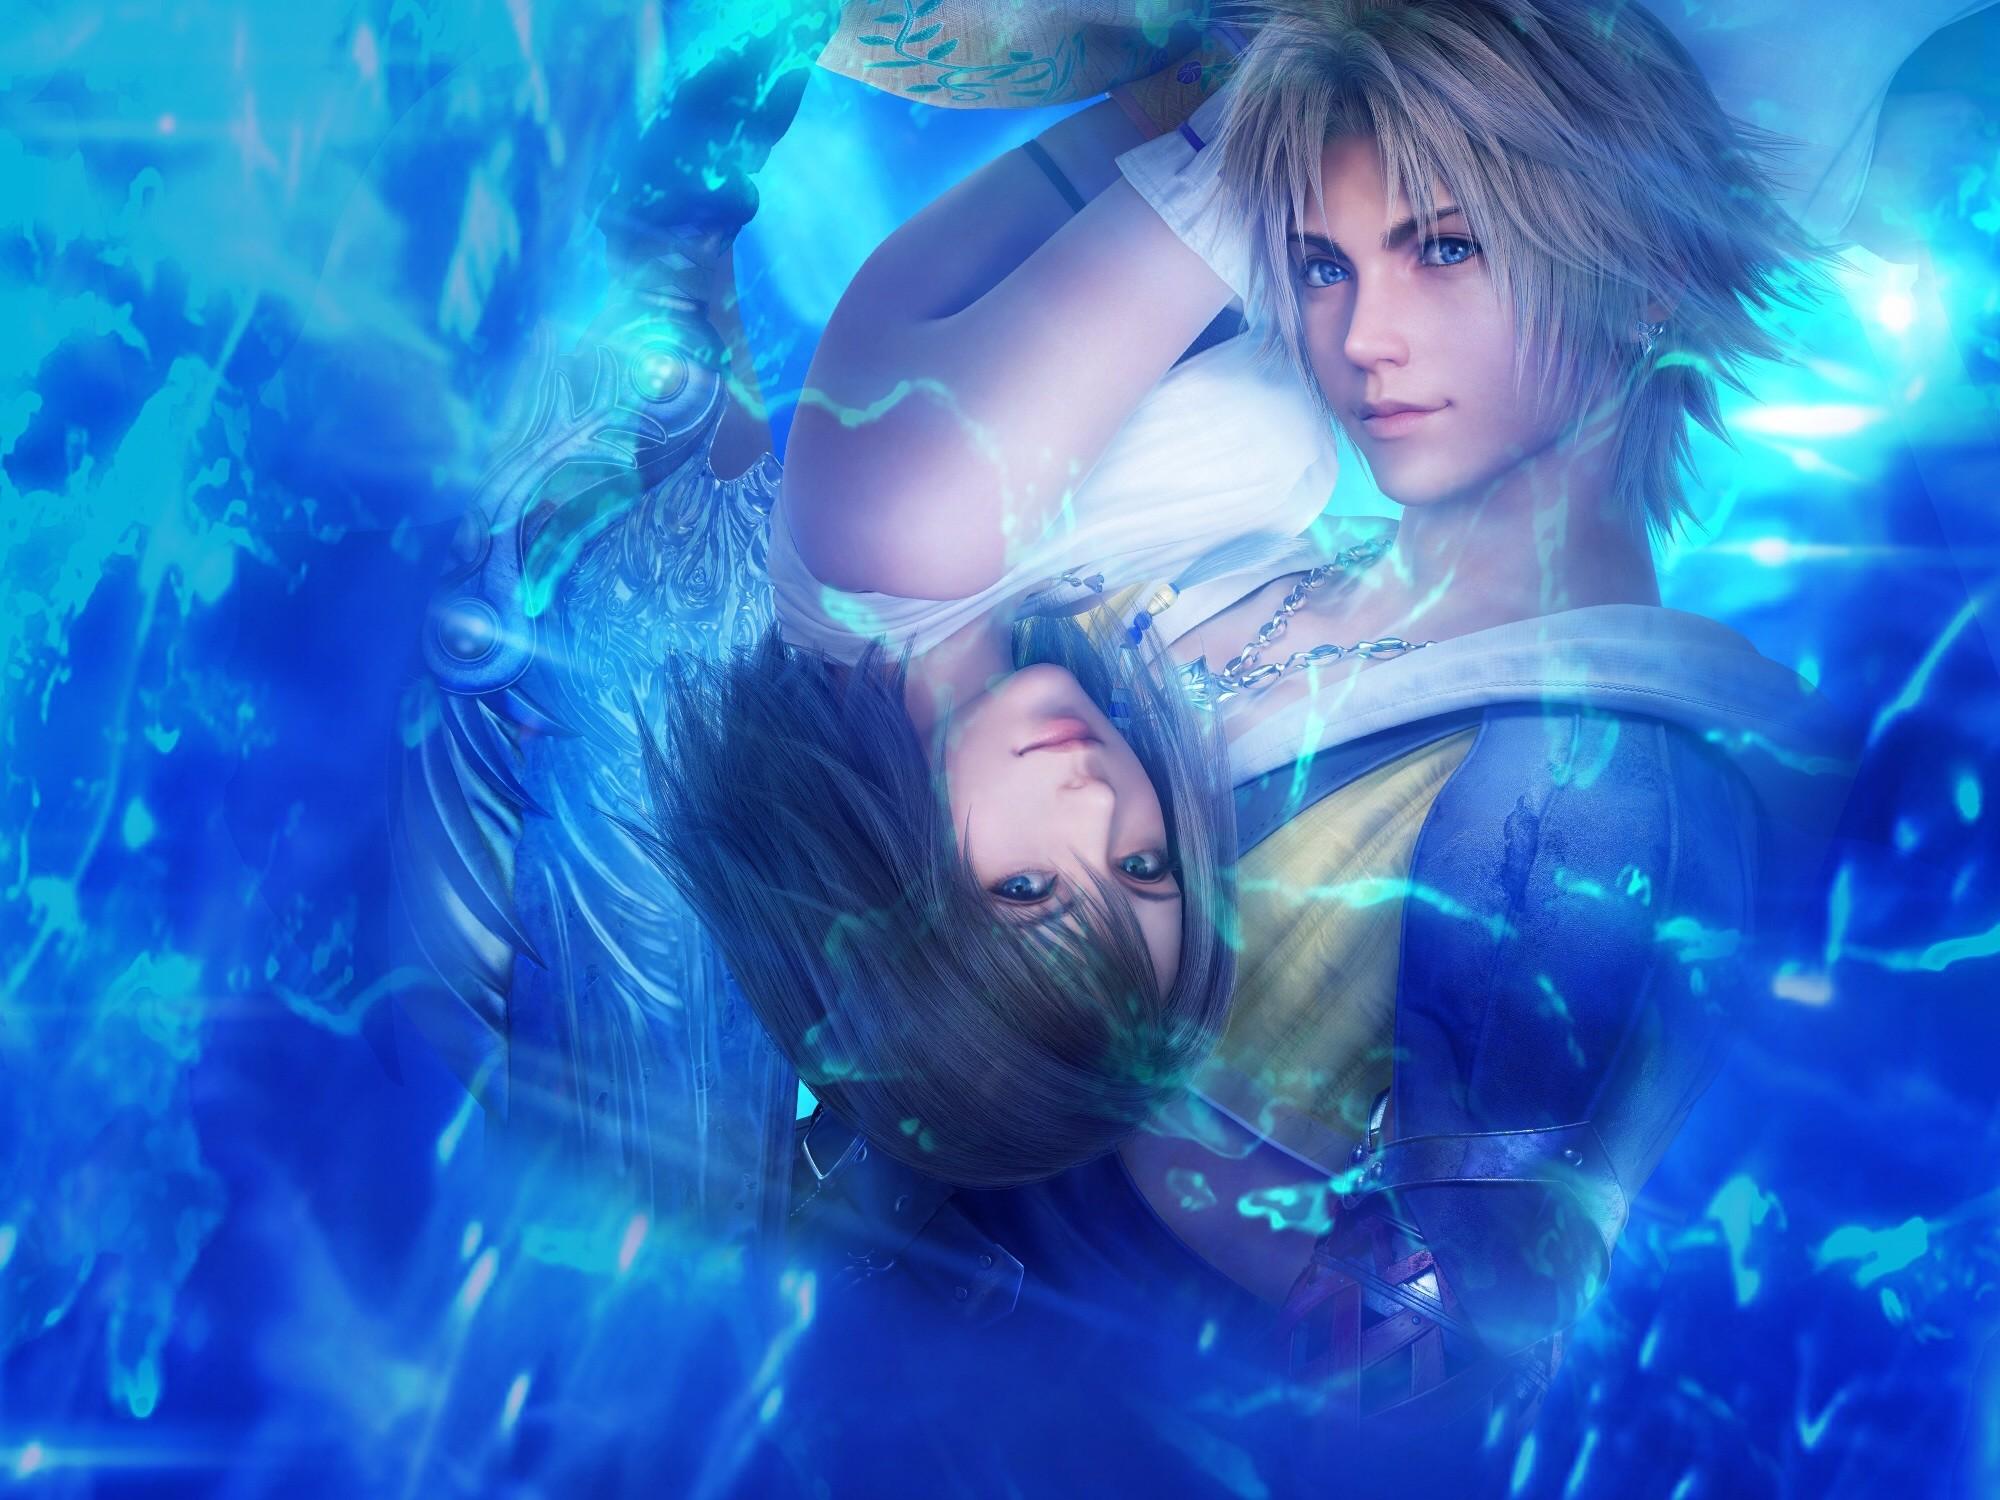 Final Fantasy X · download Final Fantasy X image